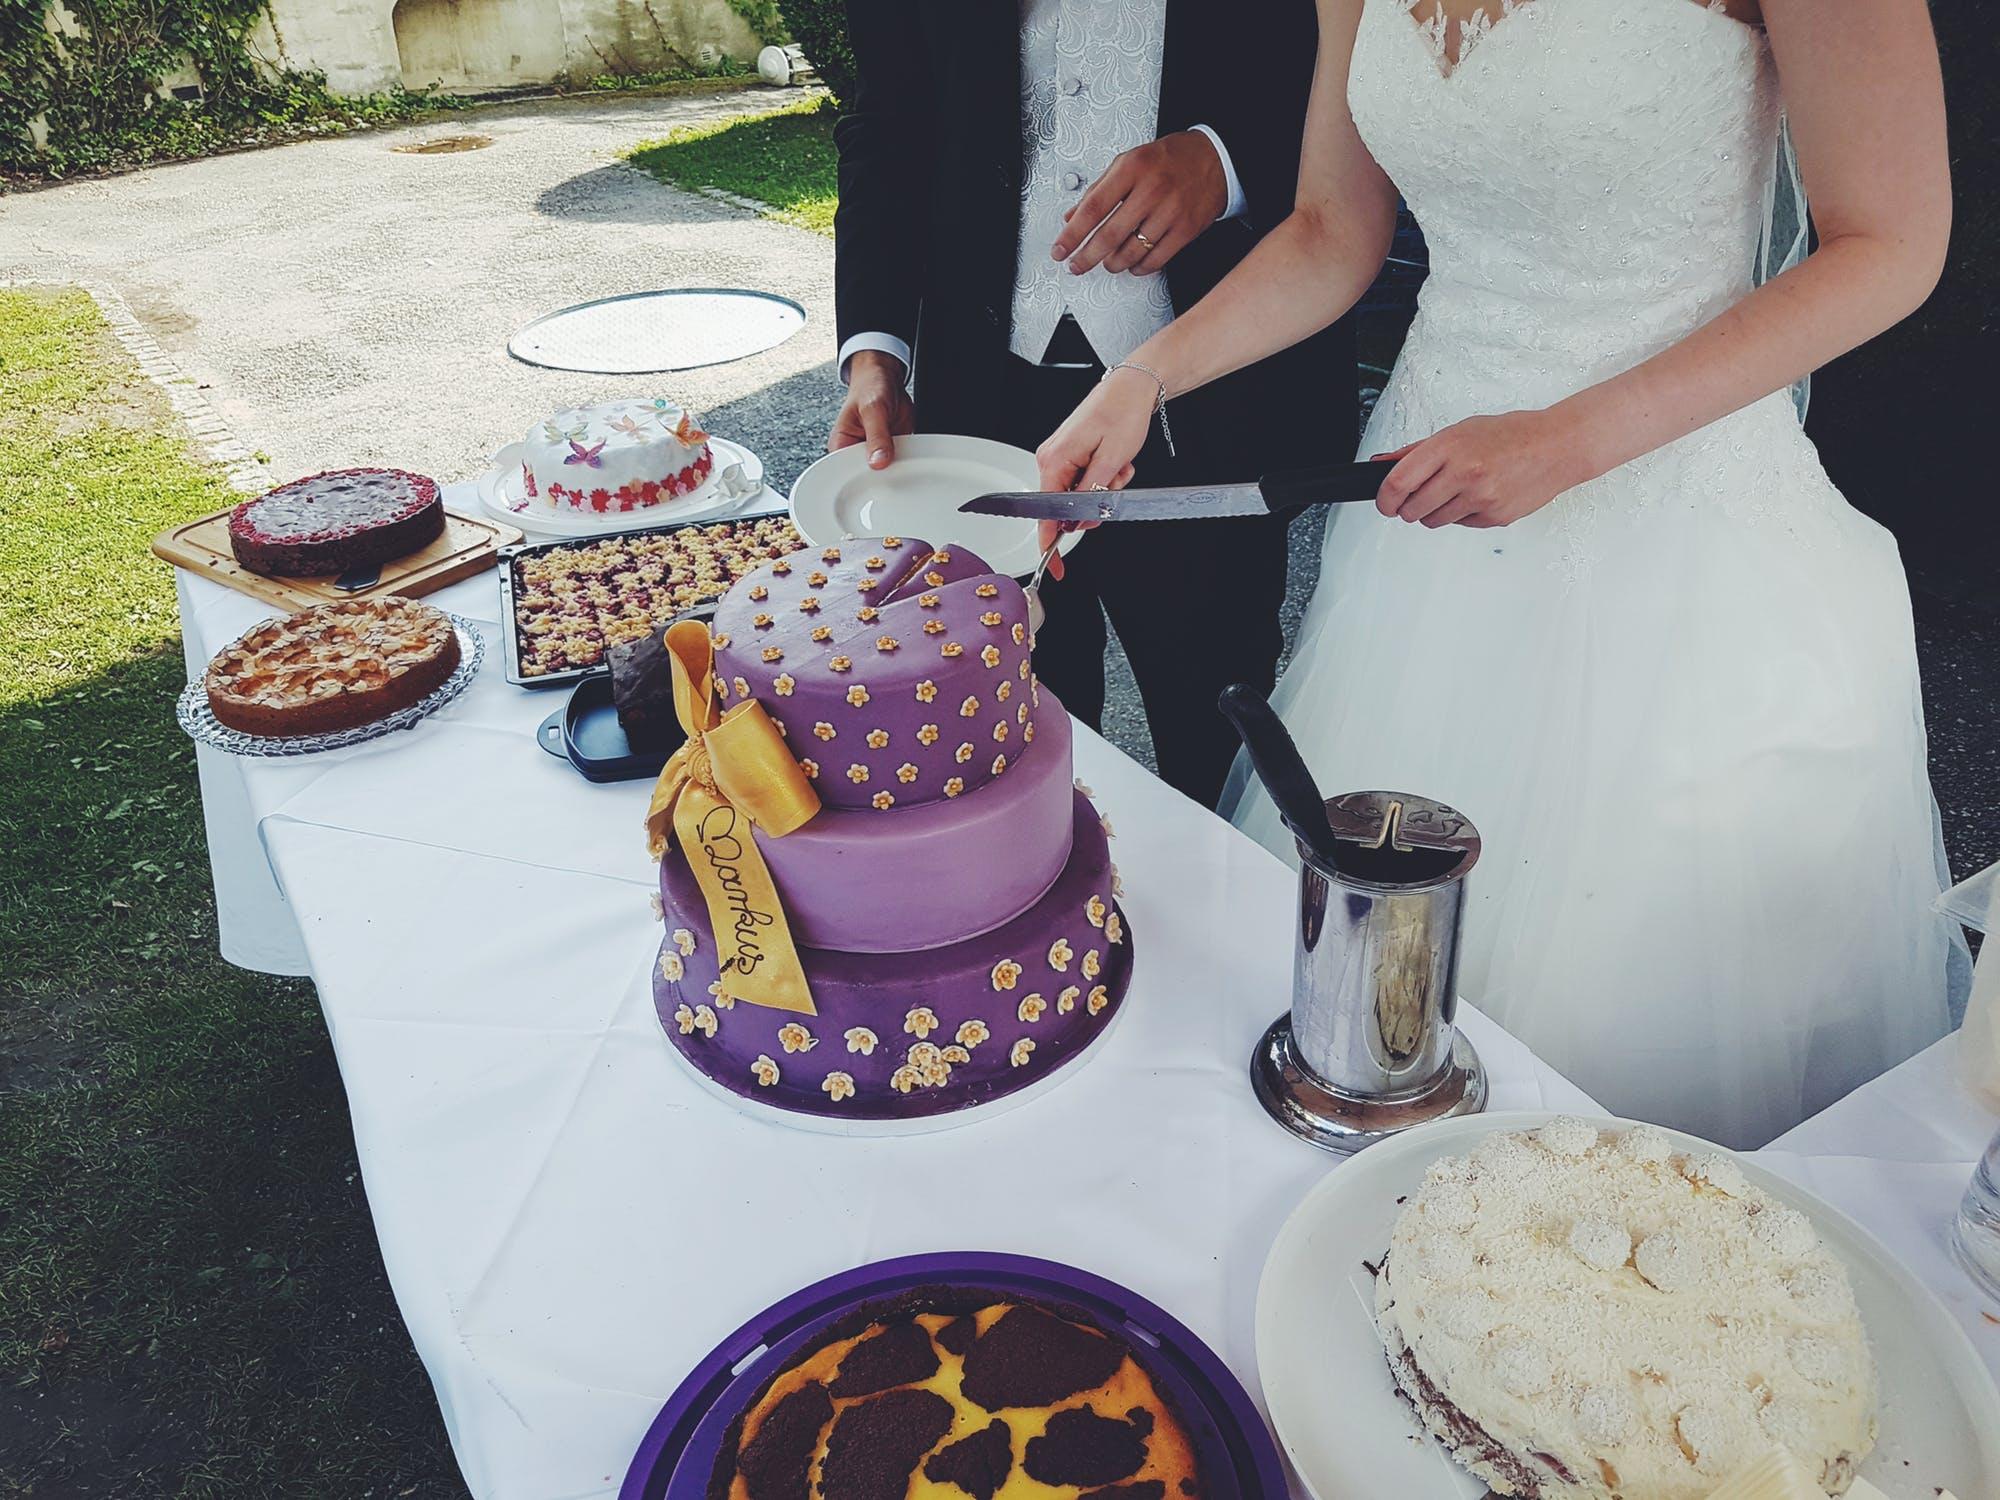 Frasi matrimonio: viva gli sposi!